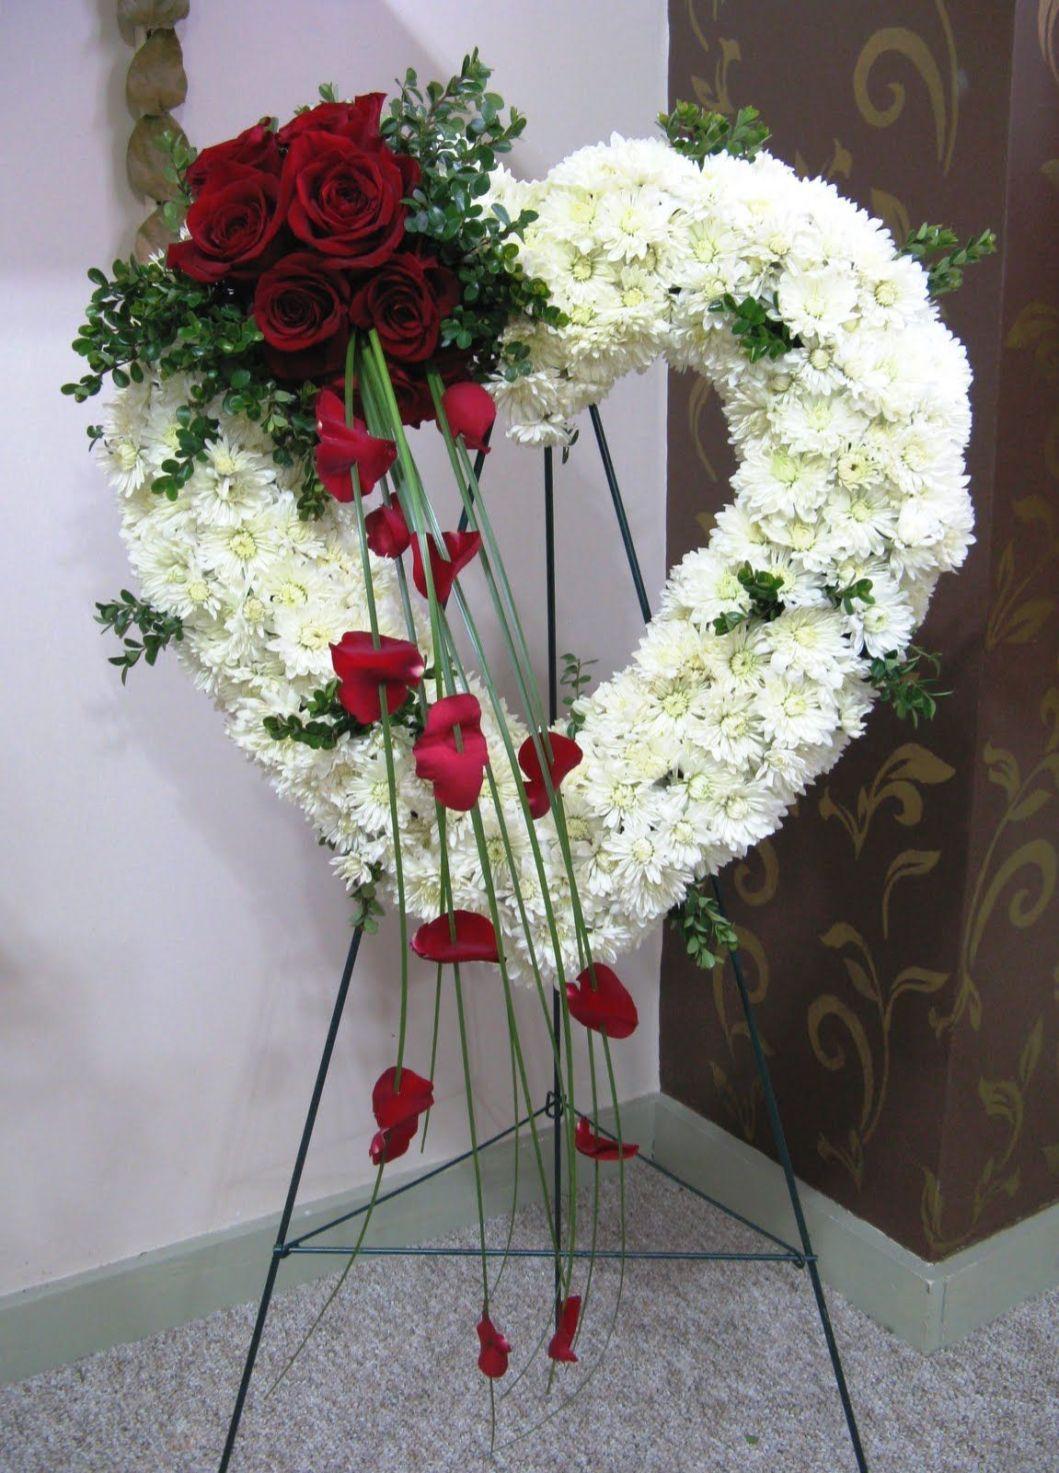 Funeral Flowers 40 | Funeral flower arrangements, Funeral floral  arrangements, Funeral floral